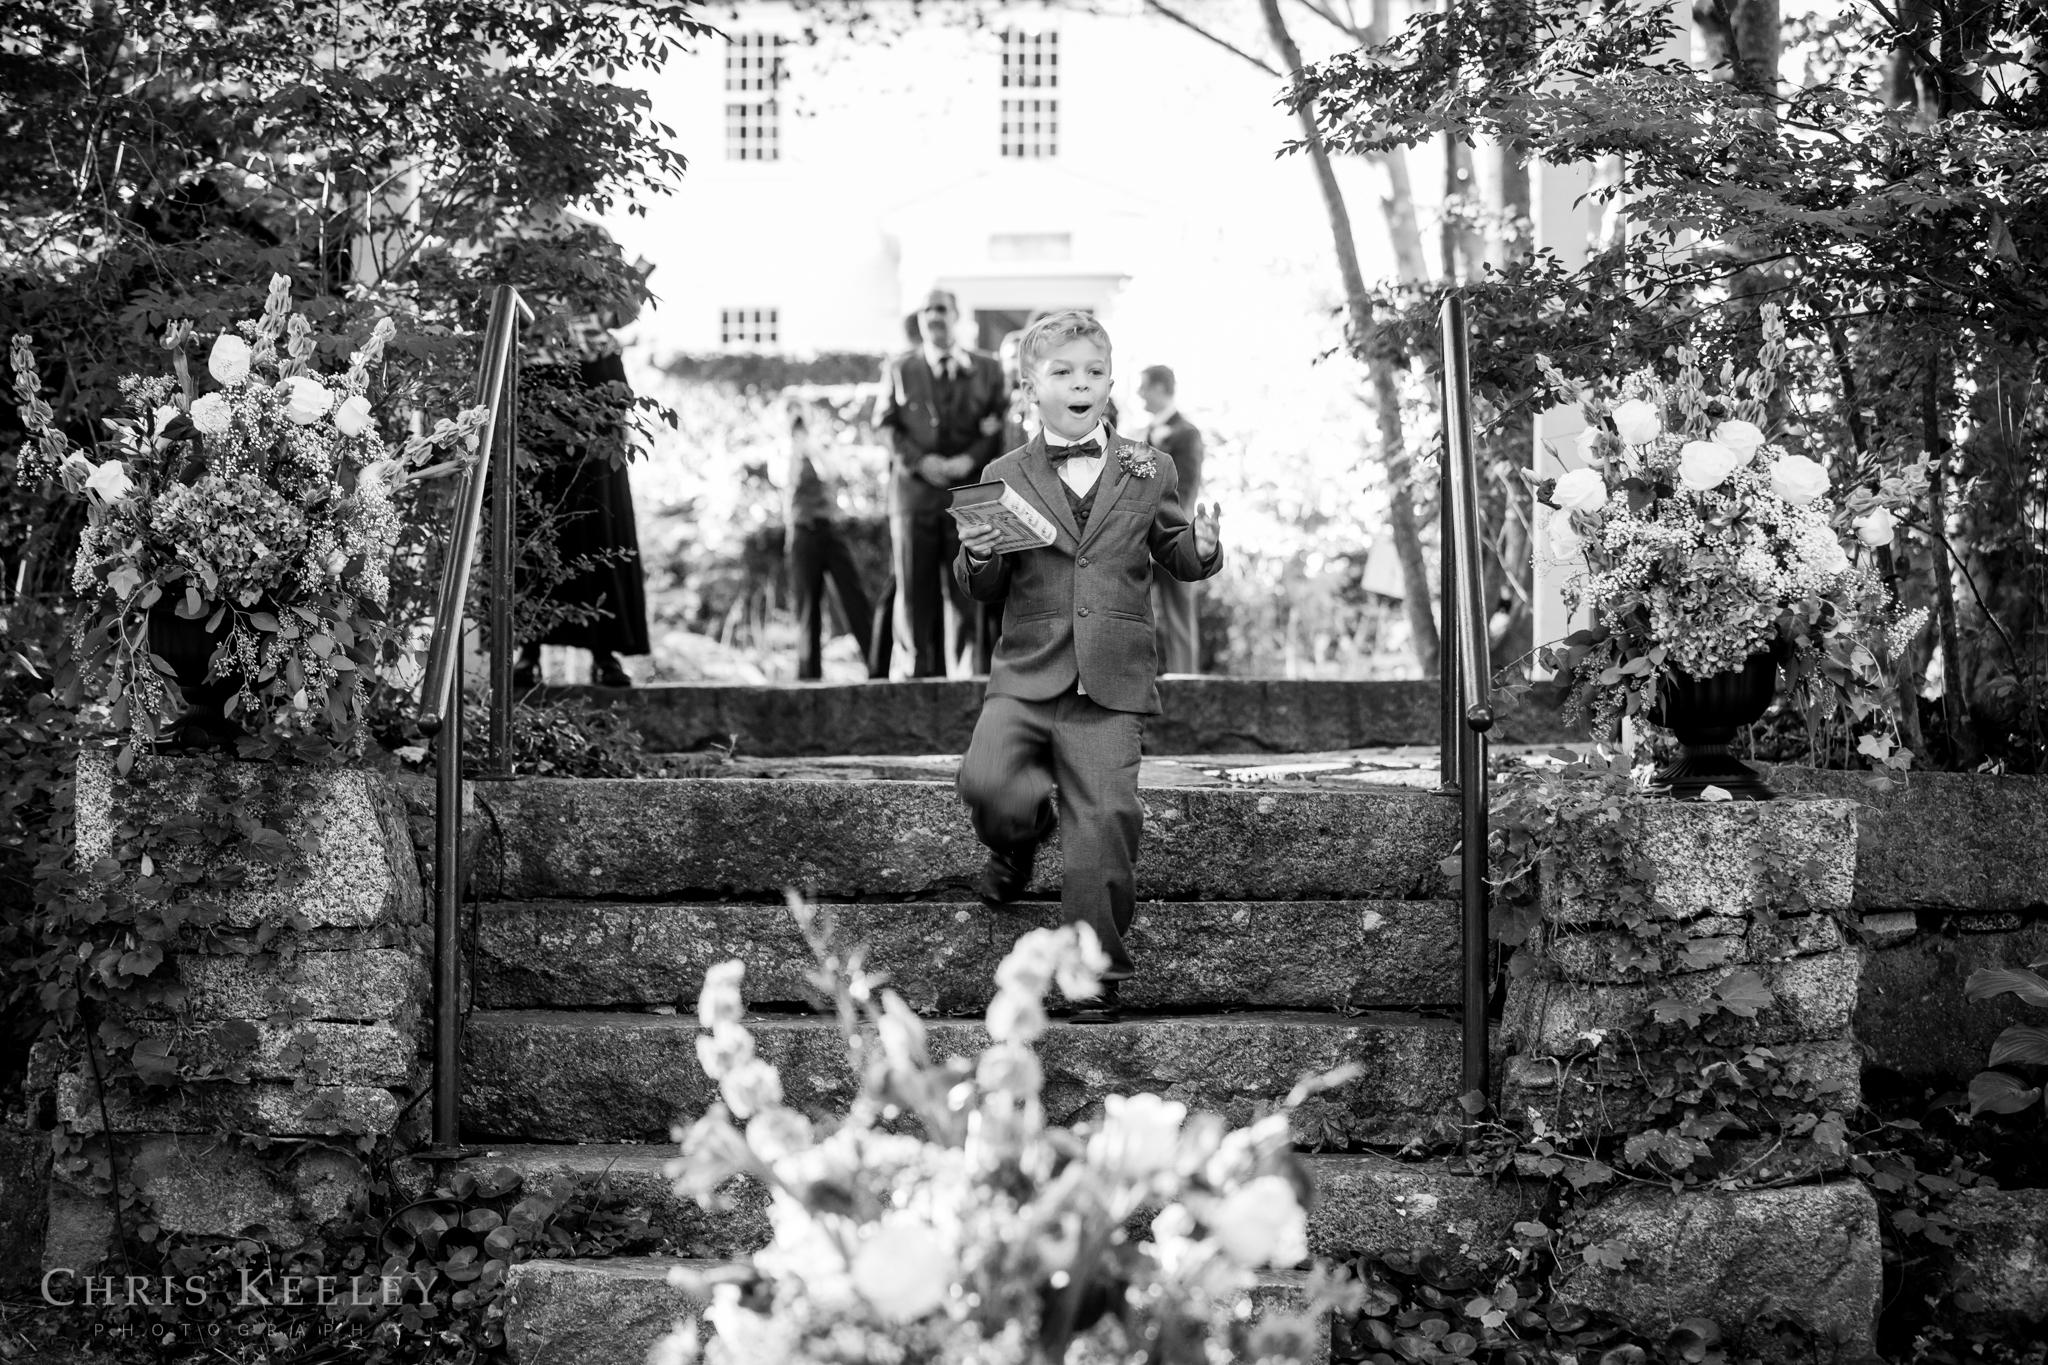 new-hampshire-wedding-photographer-three-chimneys-inn-chris-keeley-photography-10.jpg